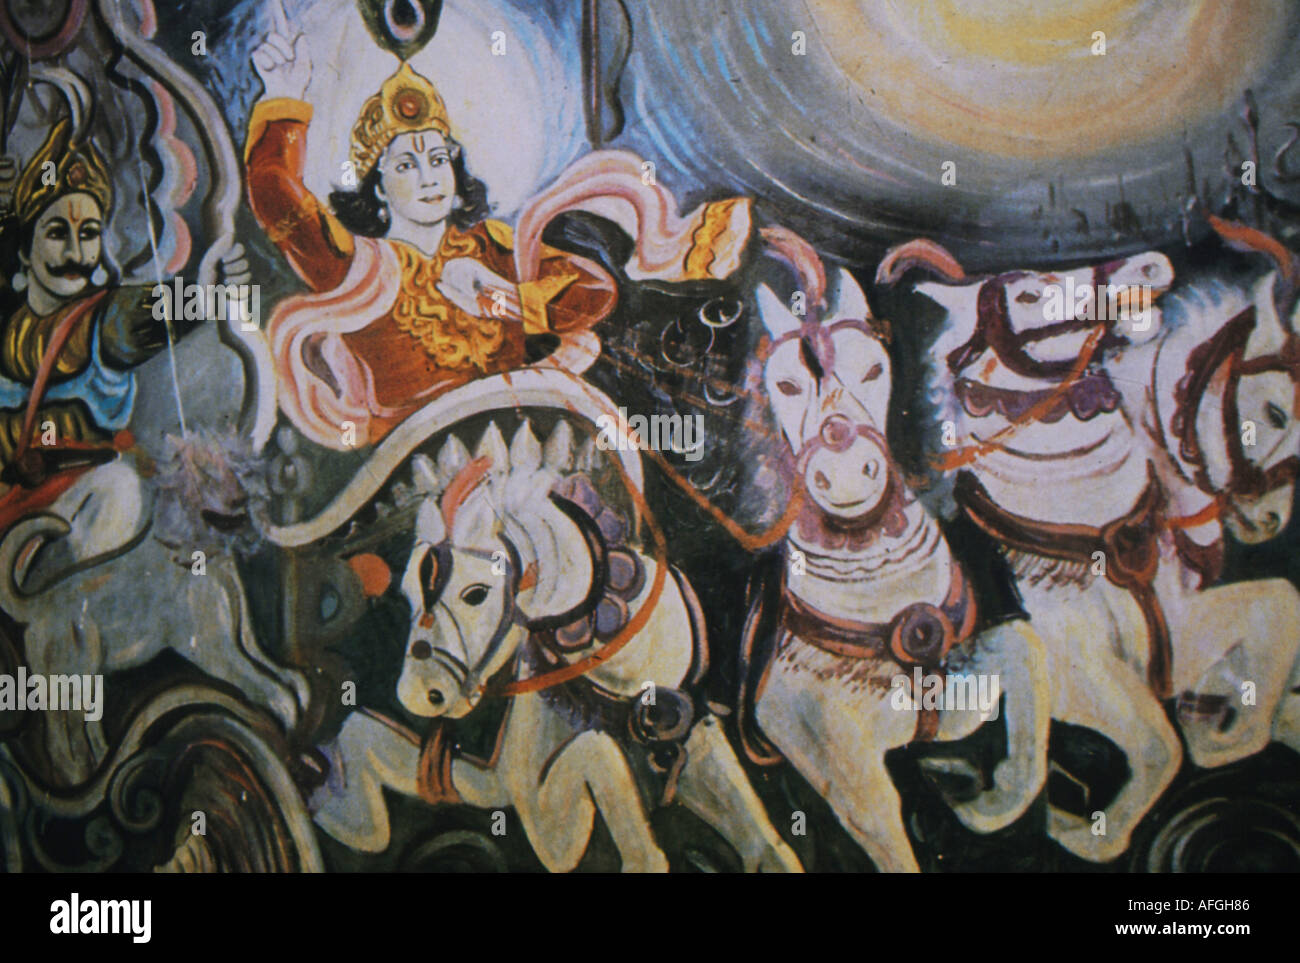 Folk art depicting Krishna in a chariot from the Bhagavad Gita - Stock Image